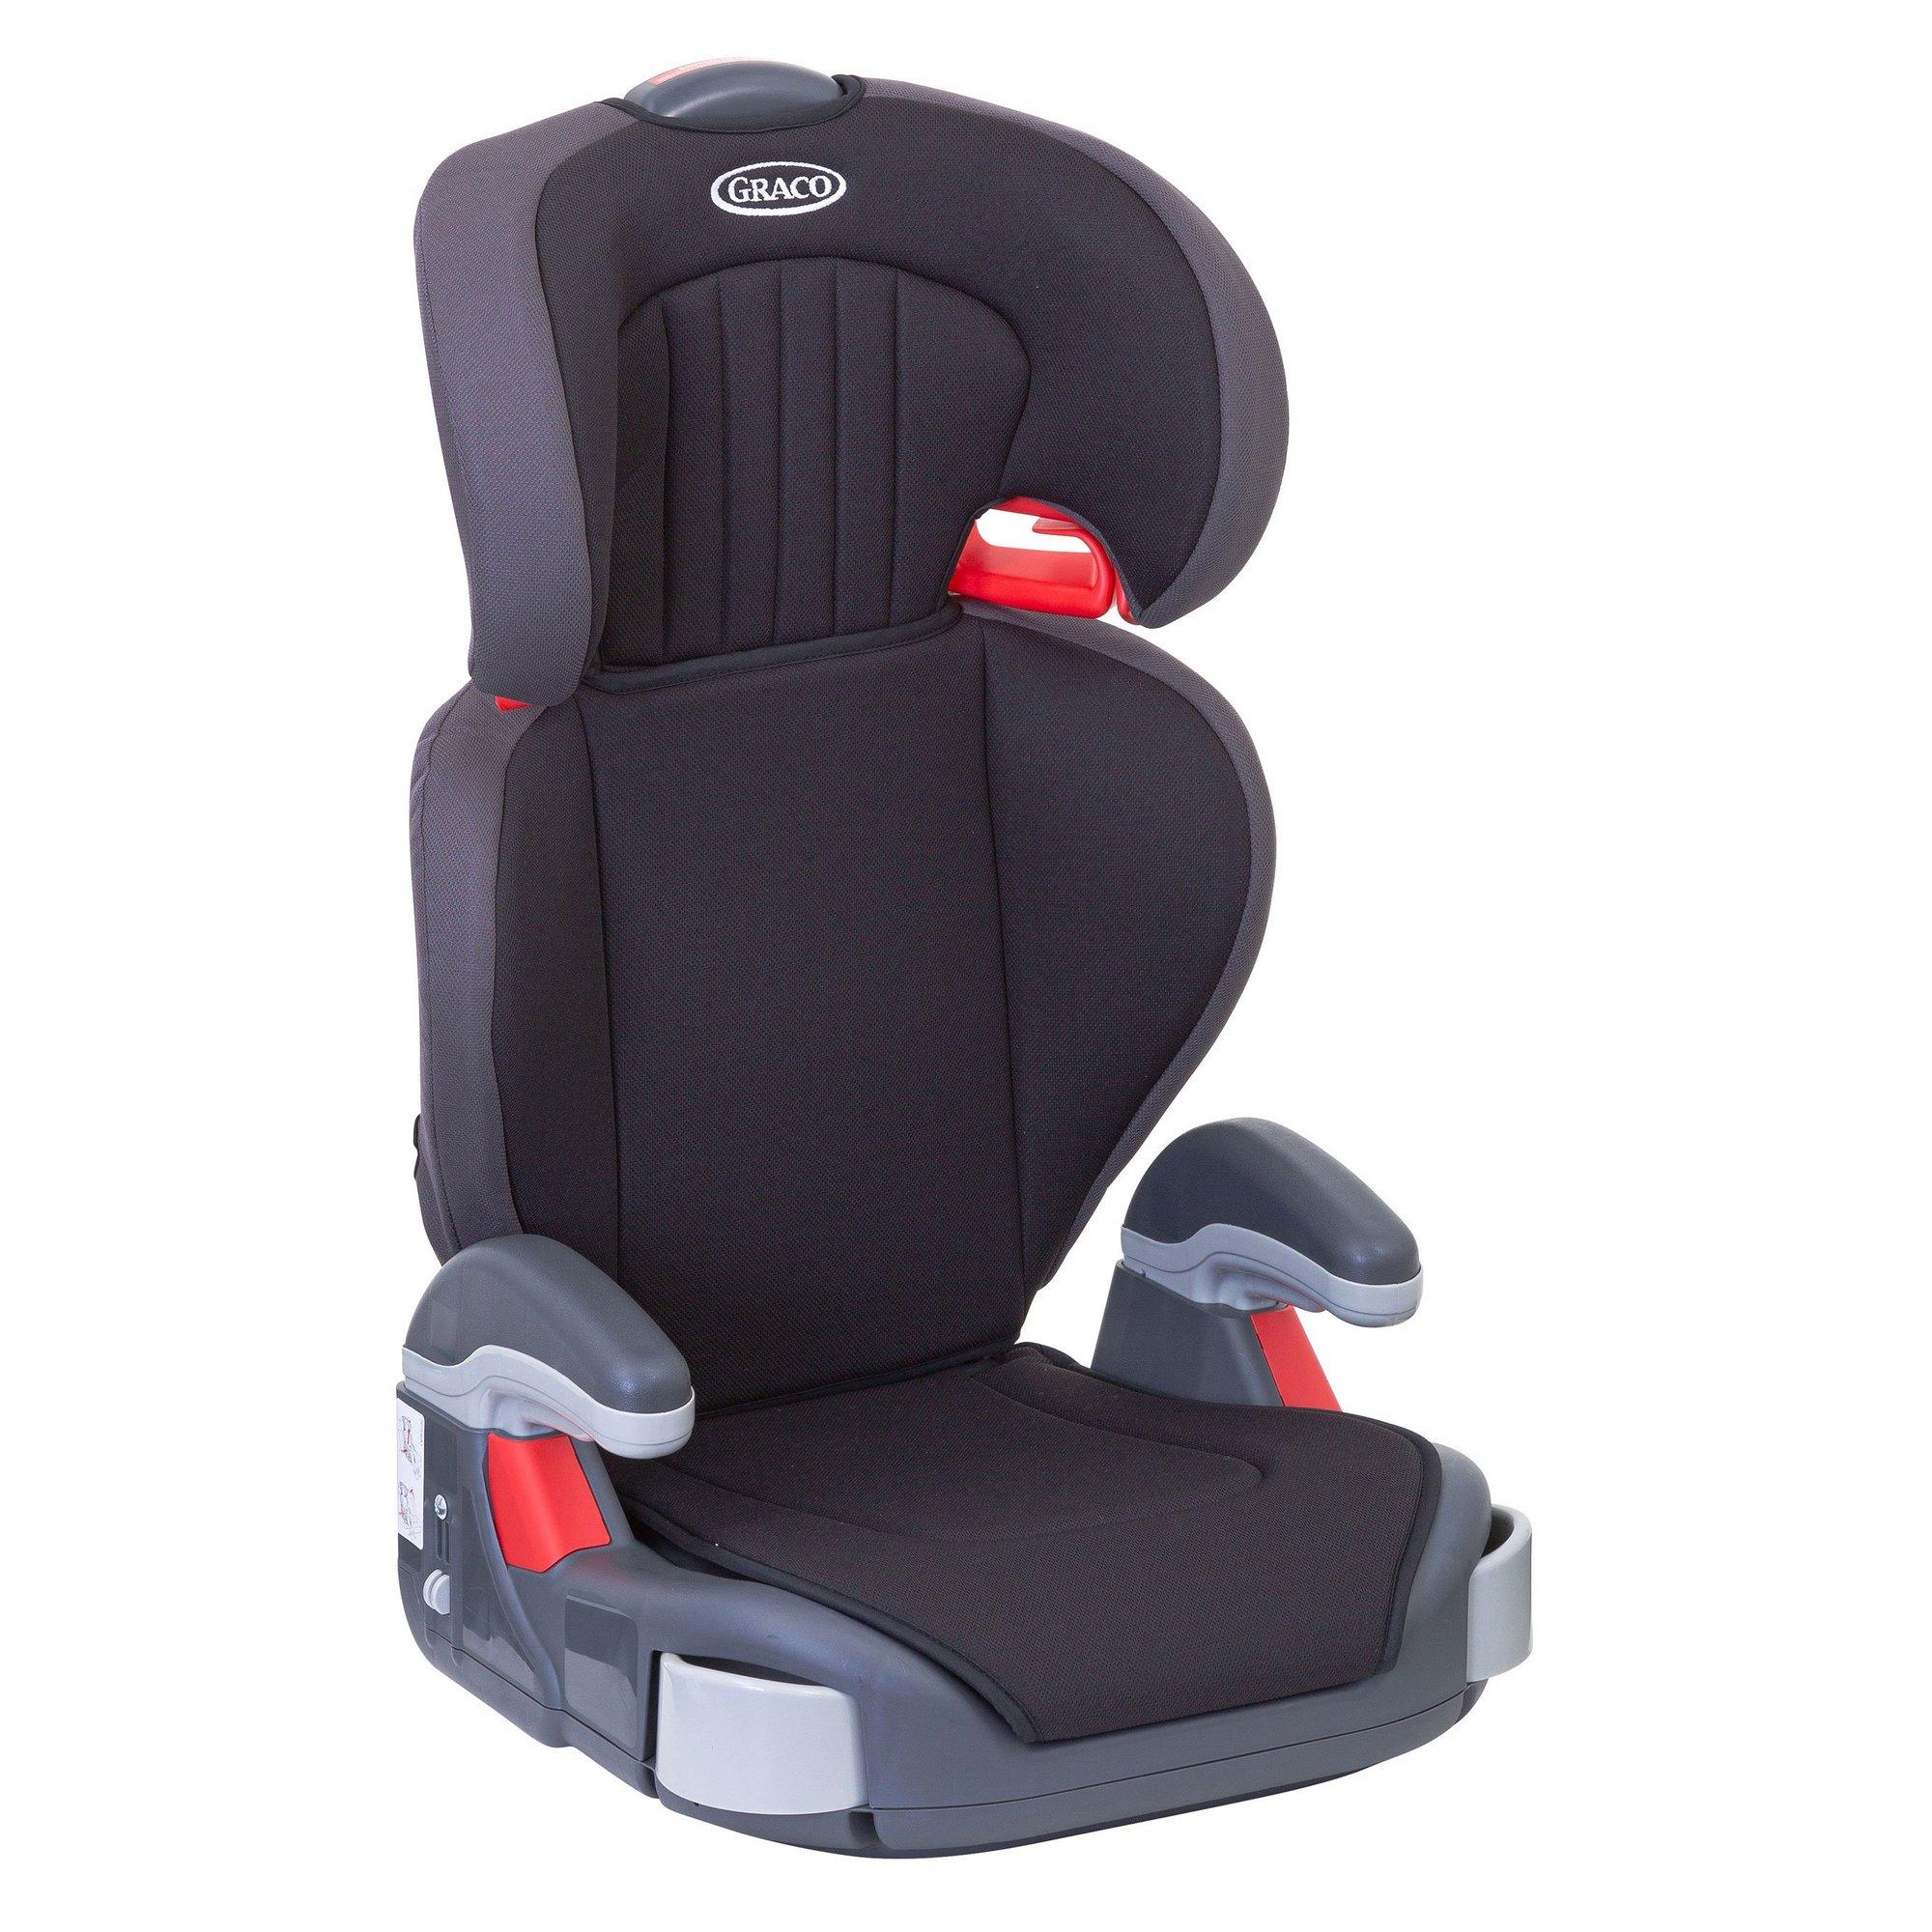 Image of Graco Black Junior Maxi Group 2/3 Car Seat